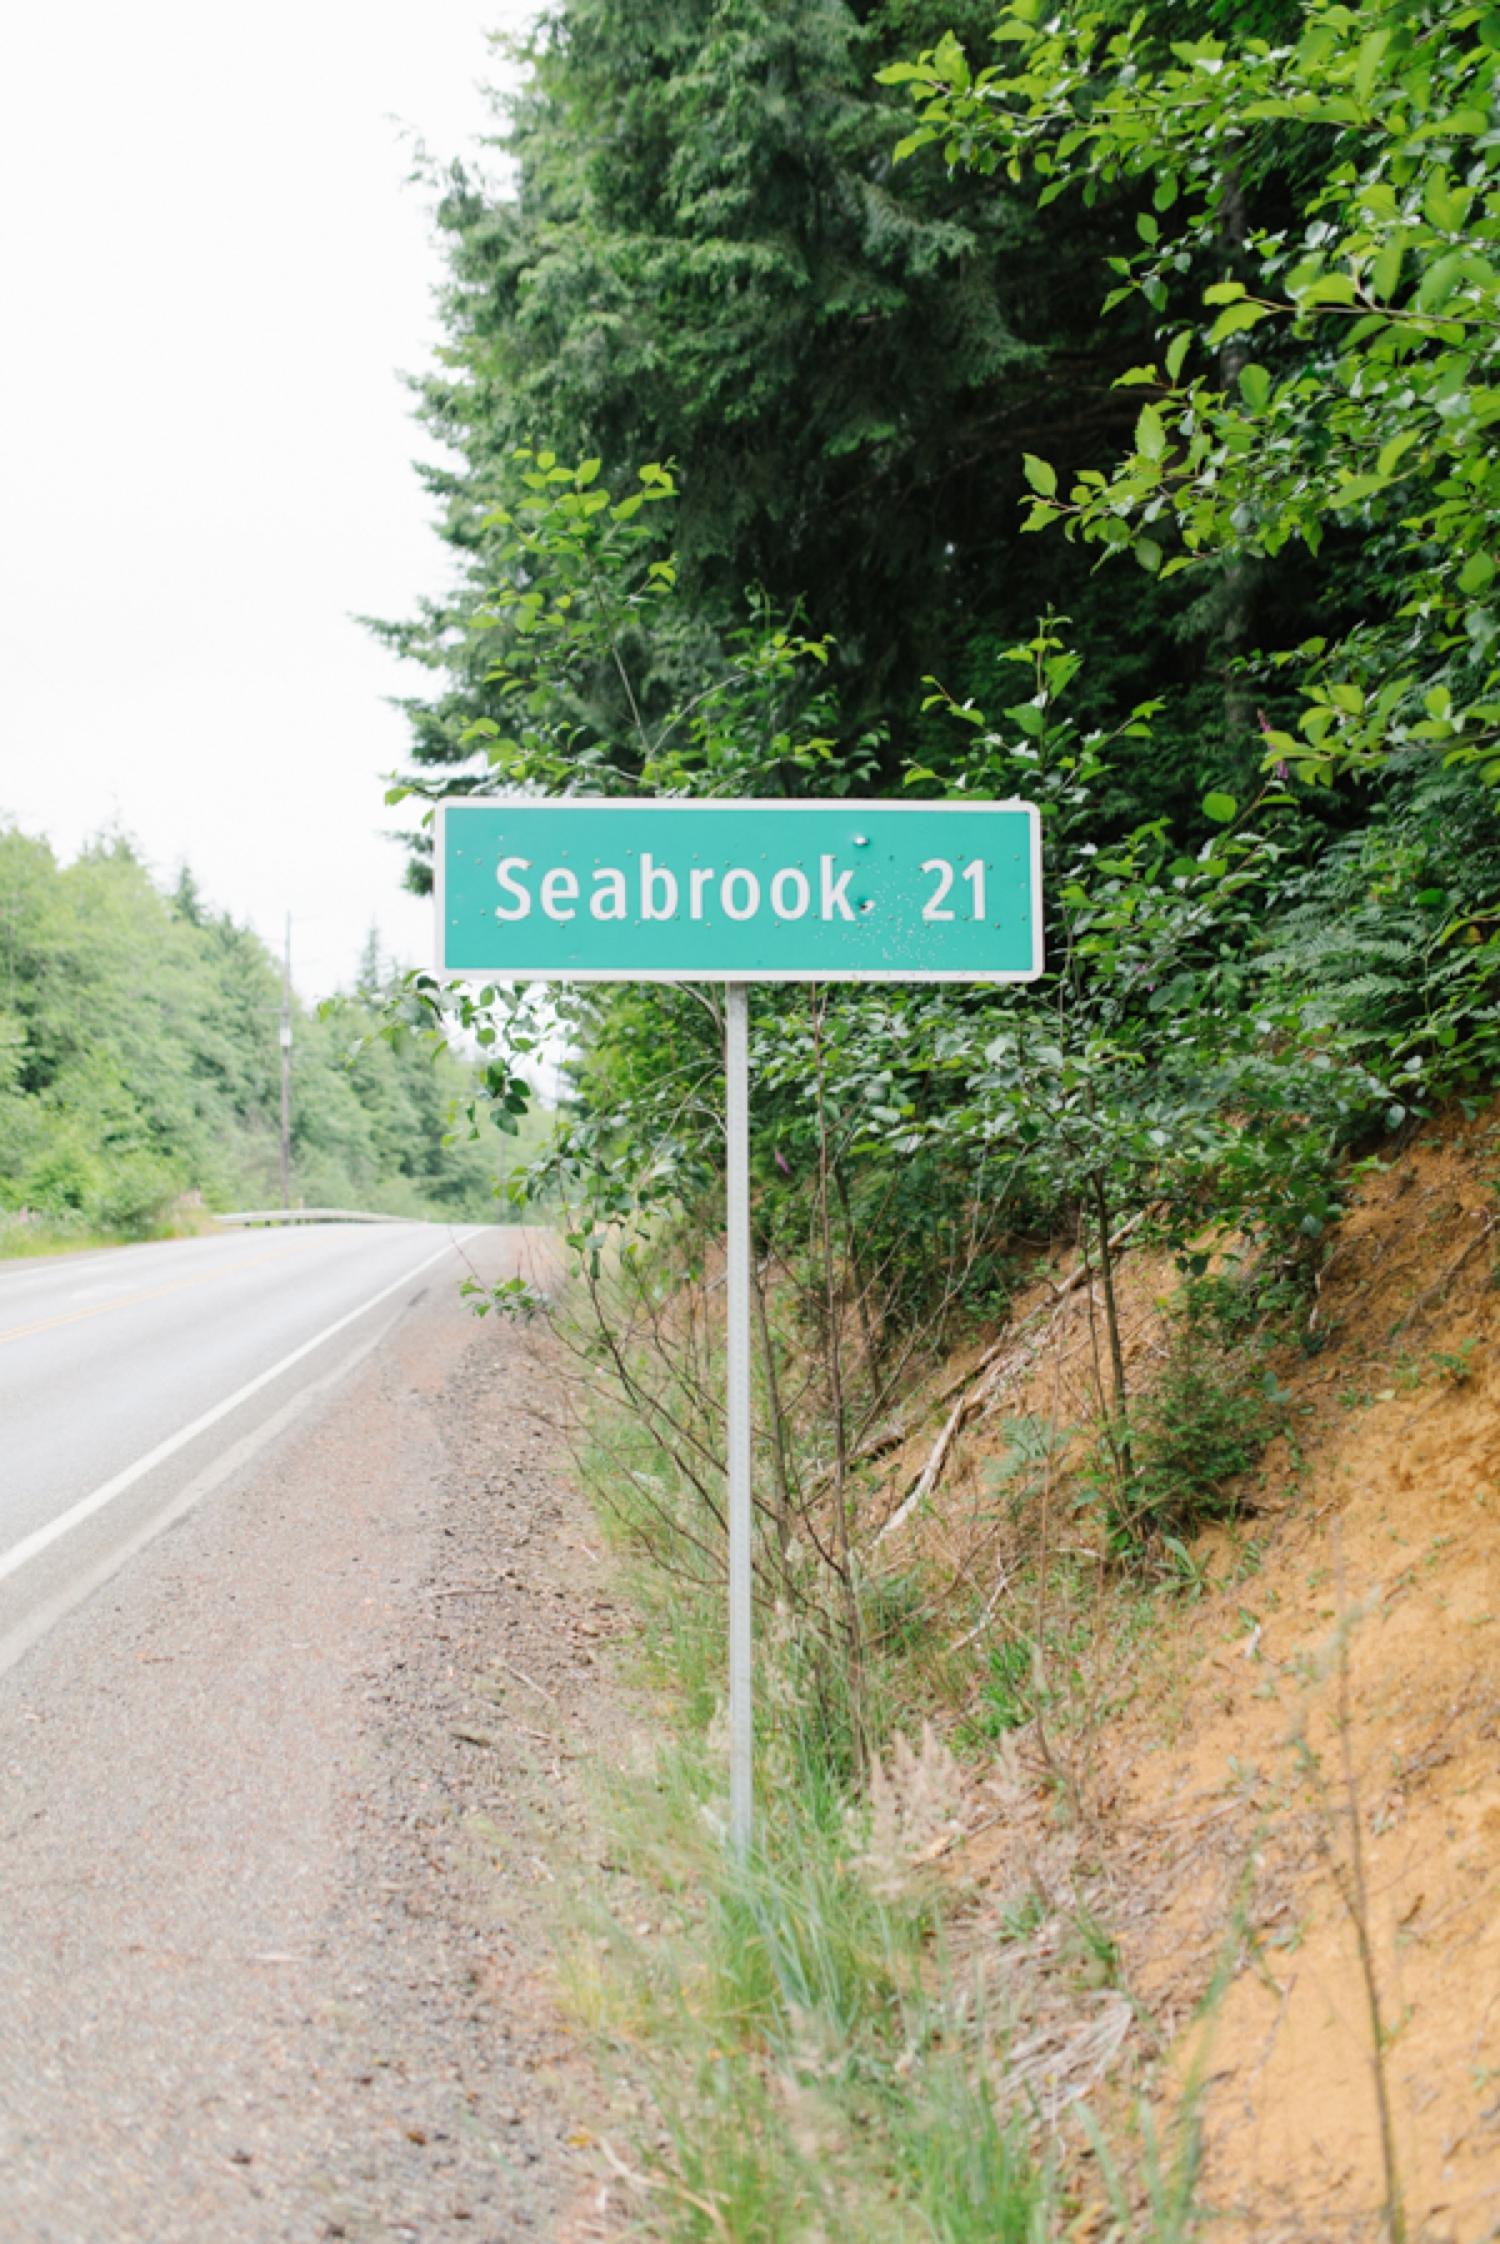 Dream Chasers Seabrook, Washington Photography Workshop | Pacific Northwest Photography Workshop | Emma Rose Company Education 1.jpg